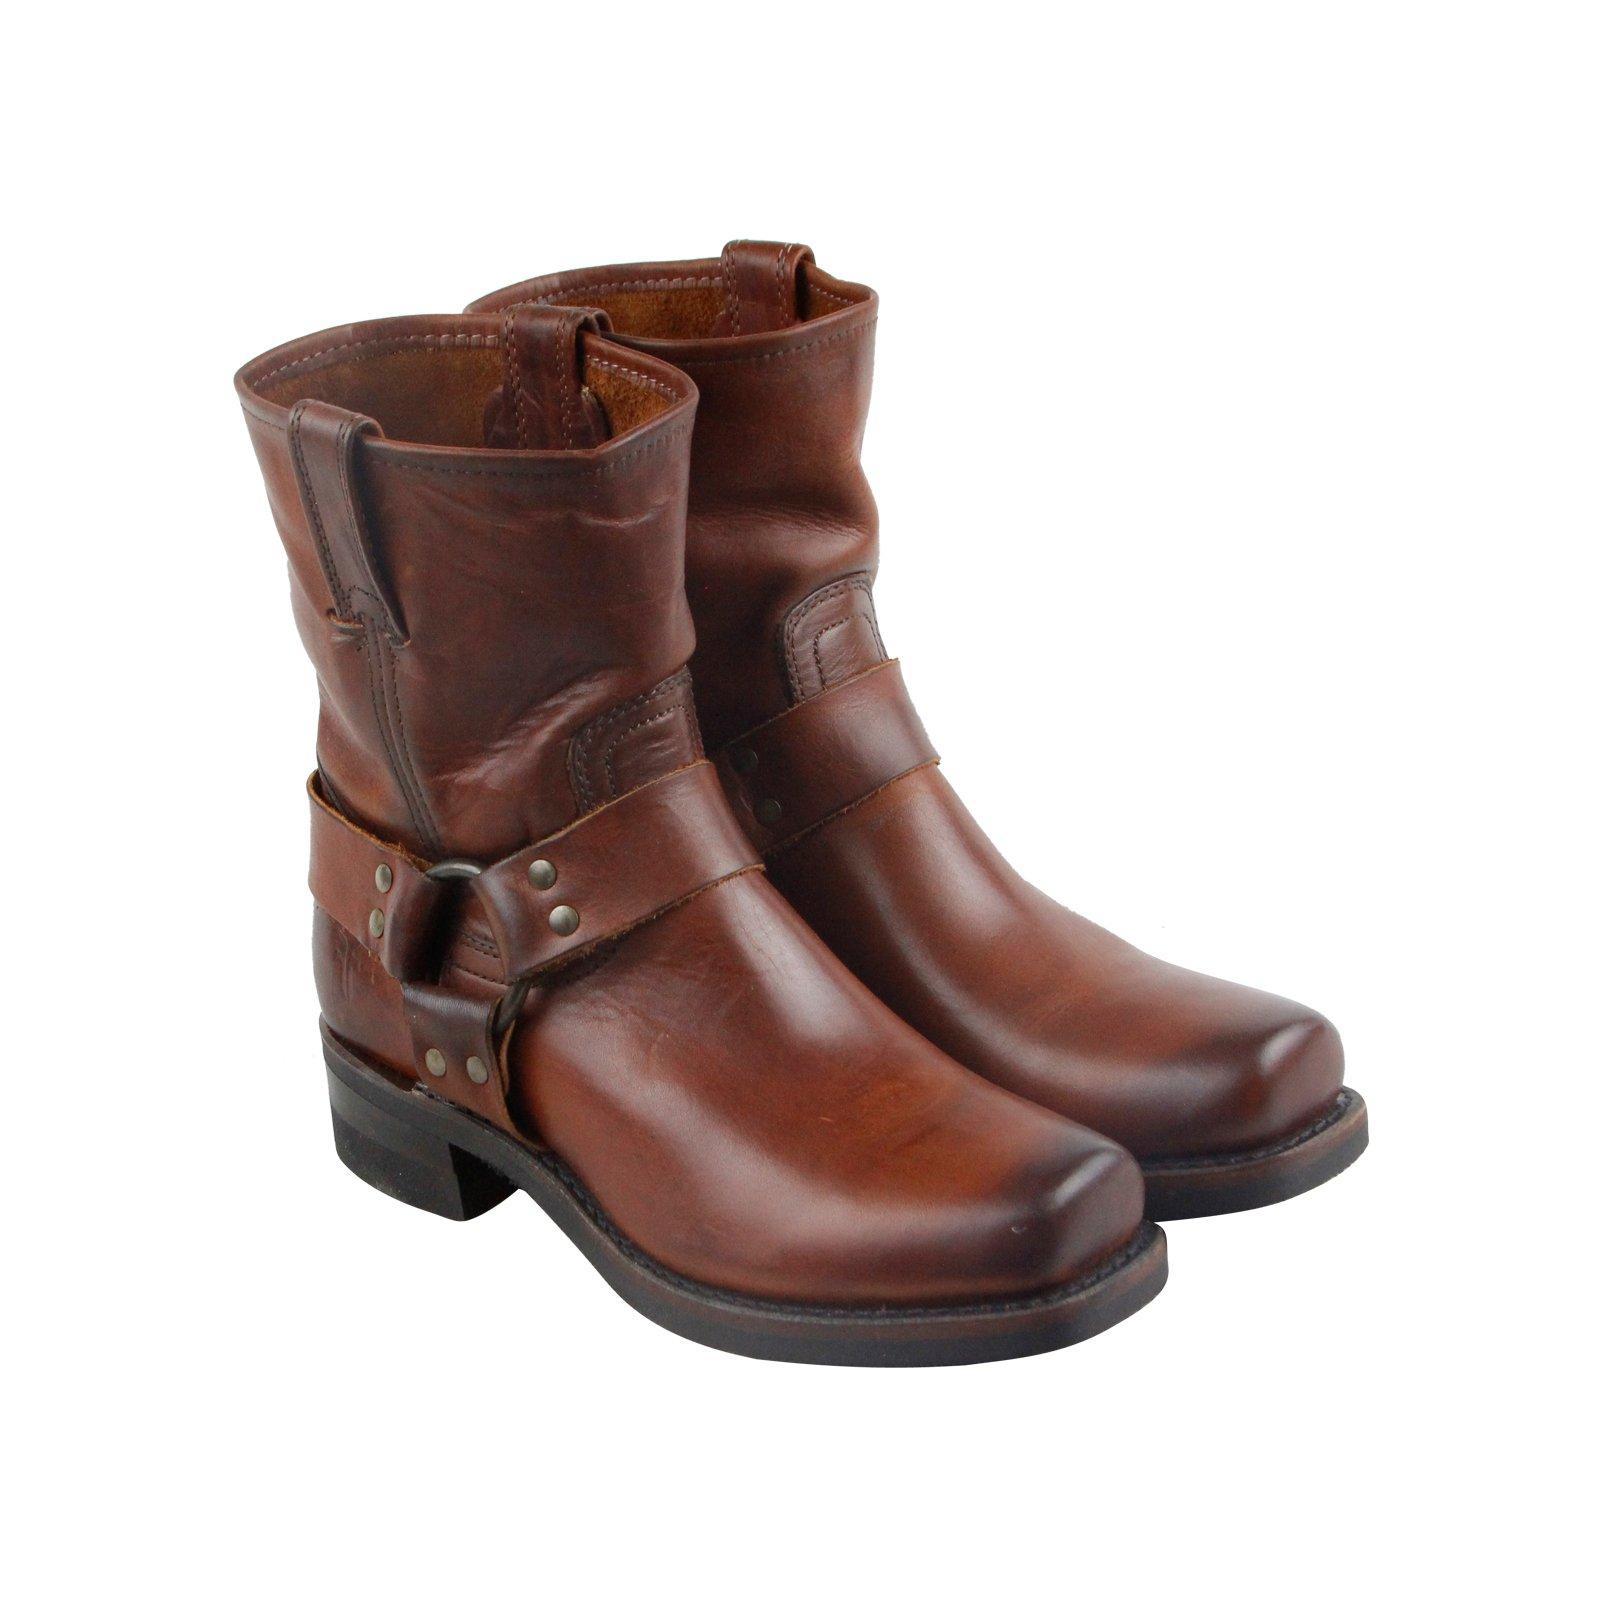 FRYE Men's Harness 8R Harness Boot, Cognac Soft Vintage Leather, 7.5 M US